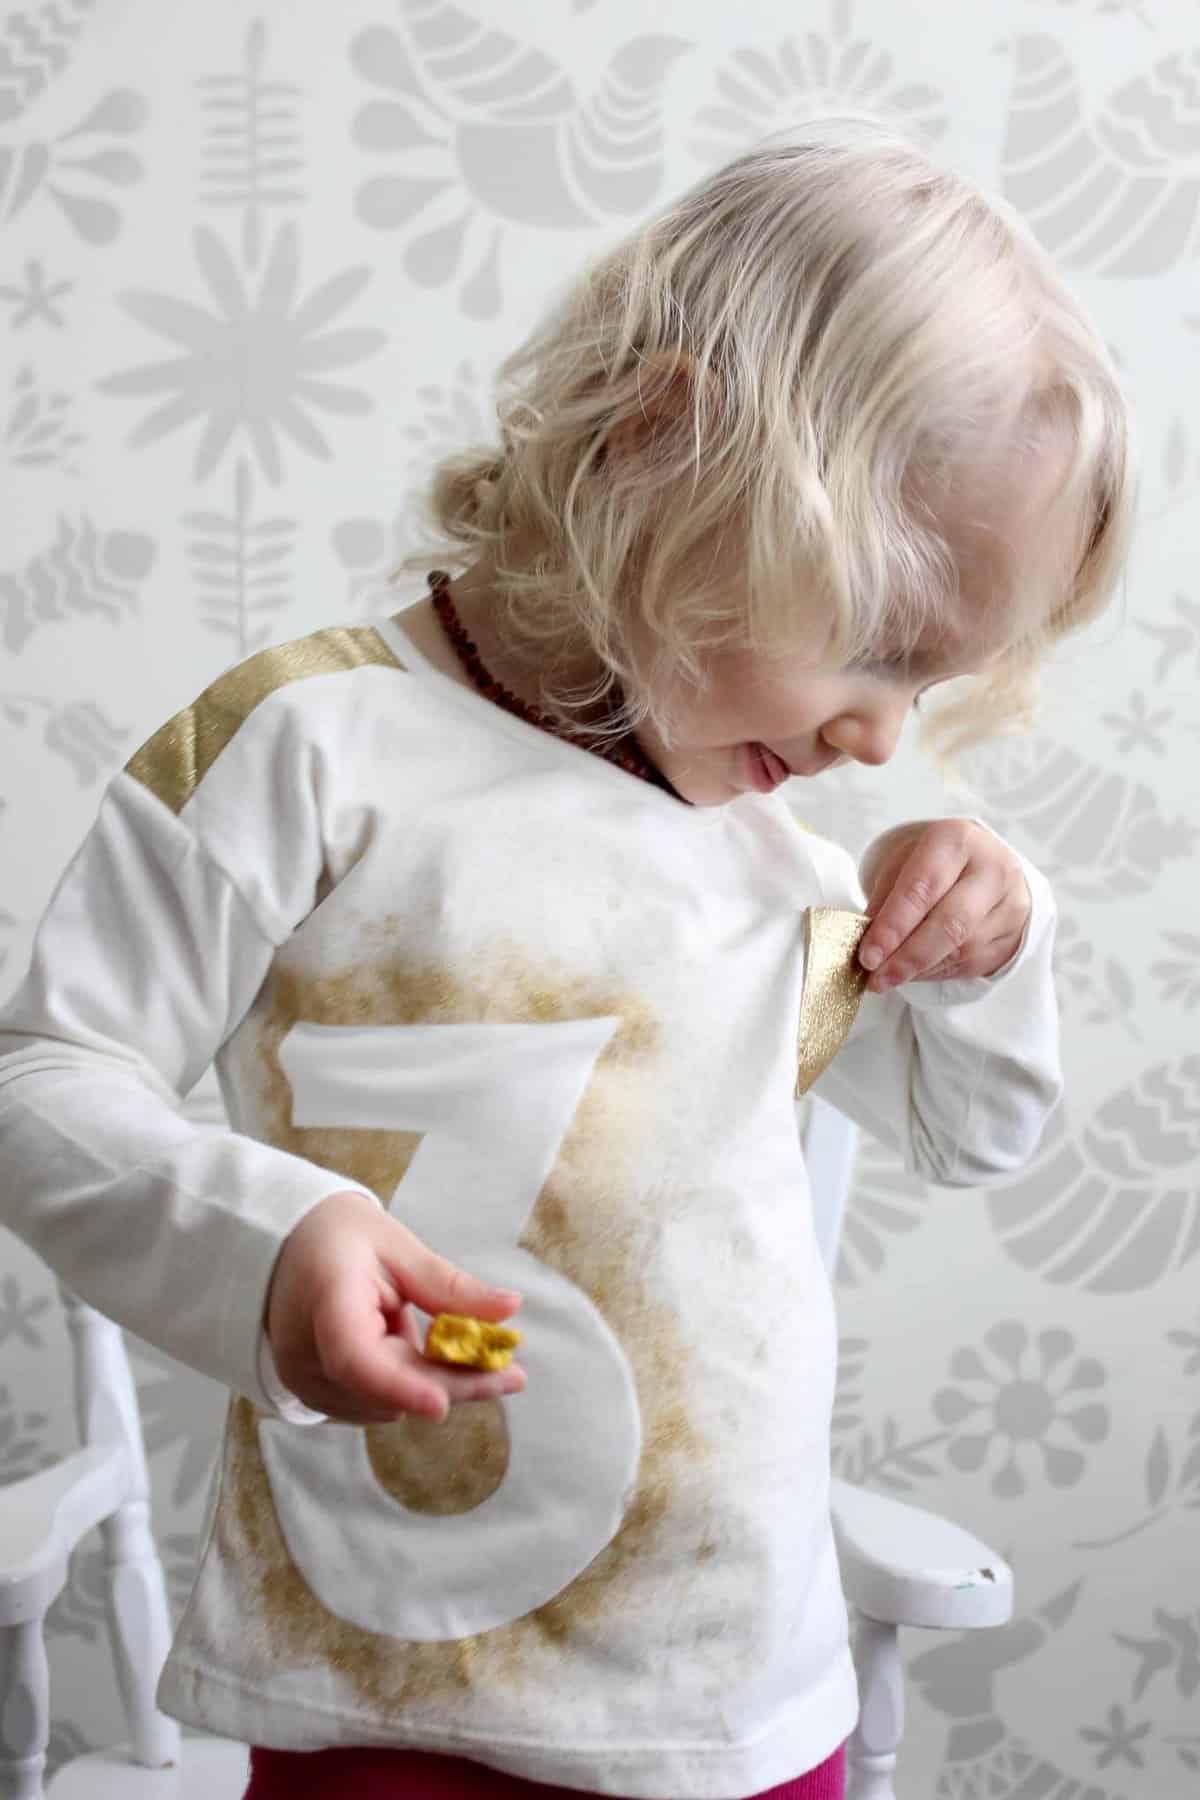 Personalized Diy Kids Birthday Shirt Idea Make It Together